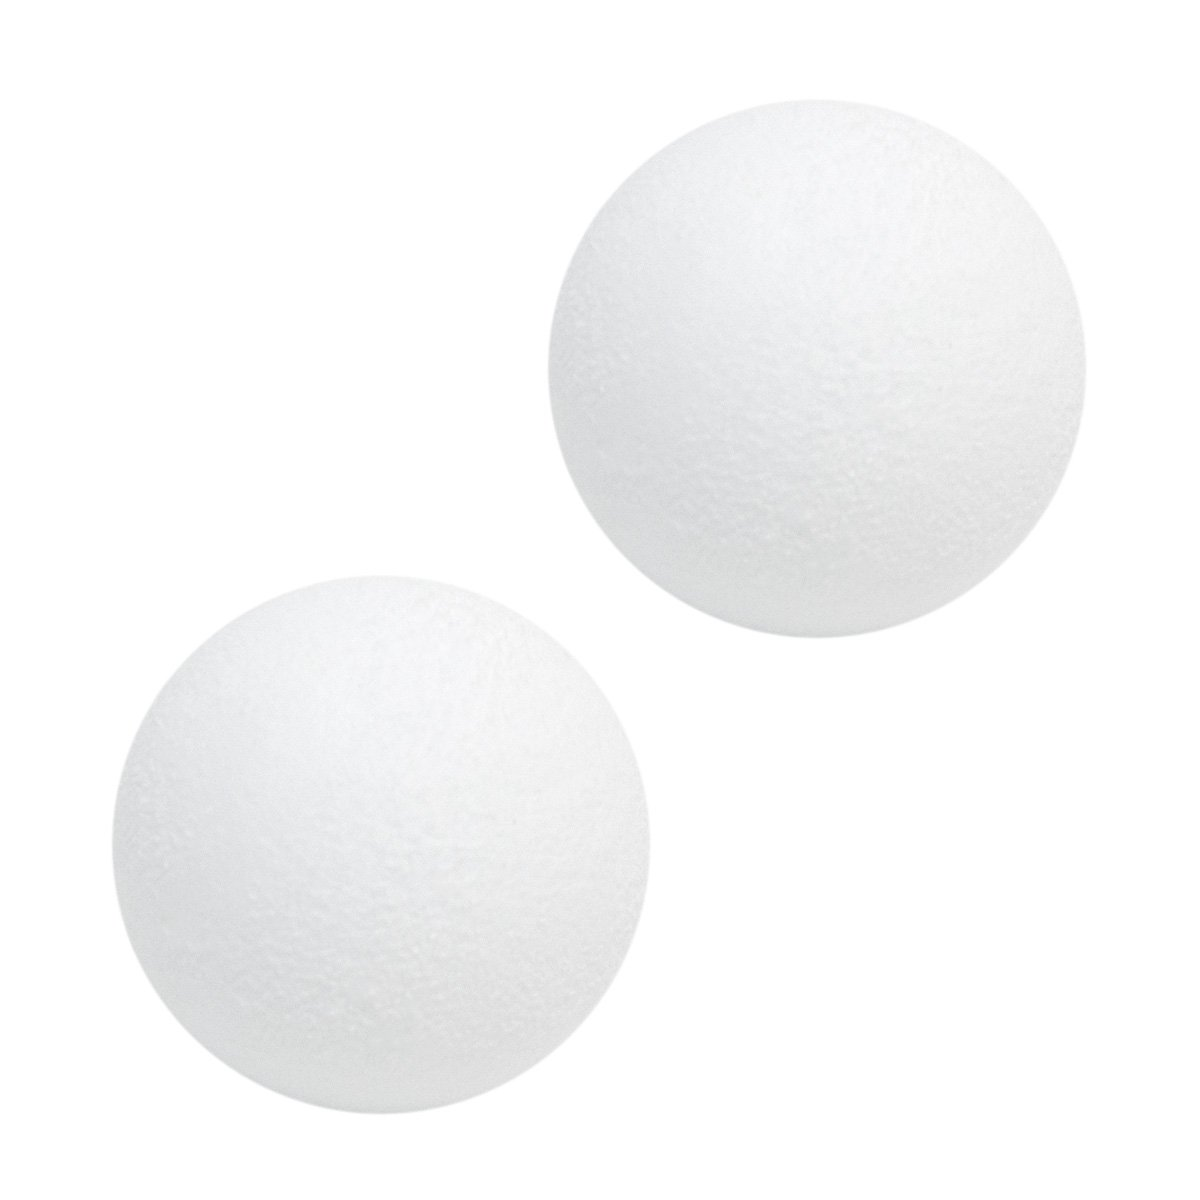 EYEPOWER Pelotas de Futbolín Ø 36 mm 21 g | Conjunto de 2 Bolas de ...